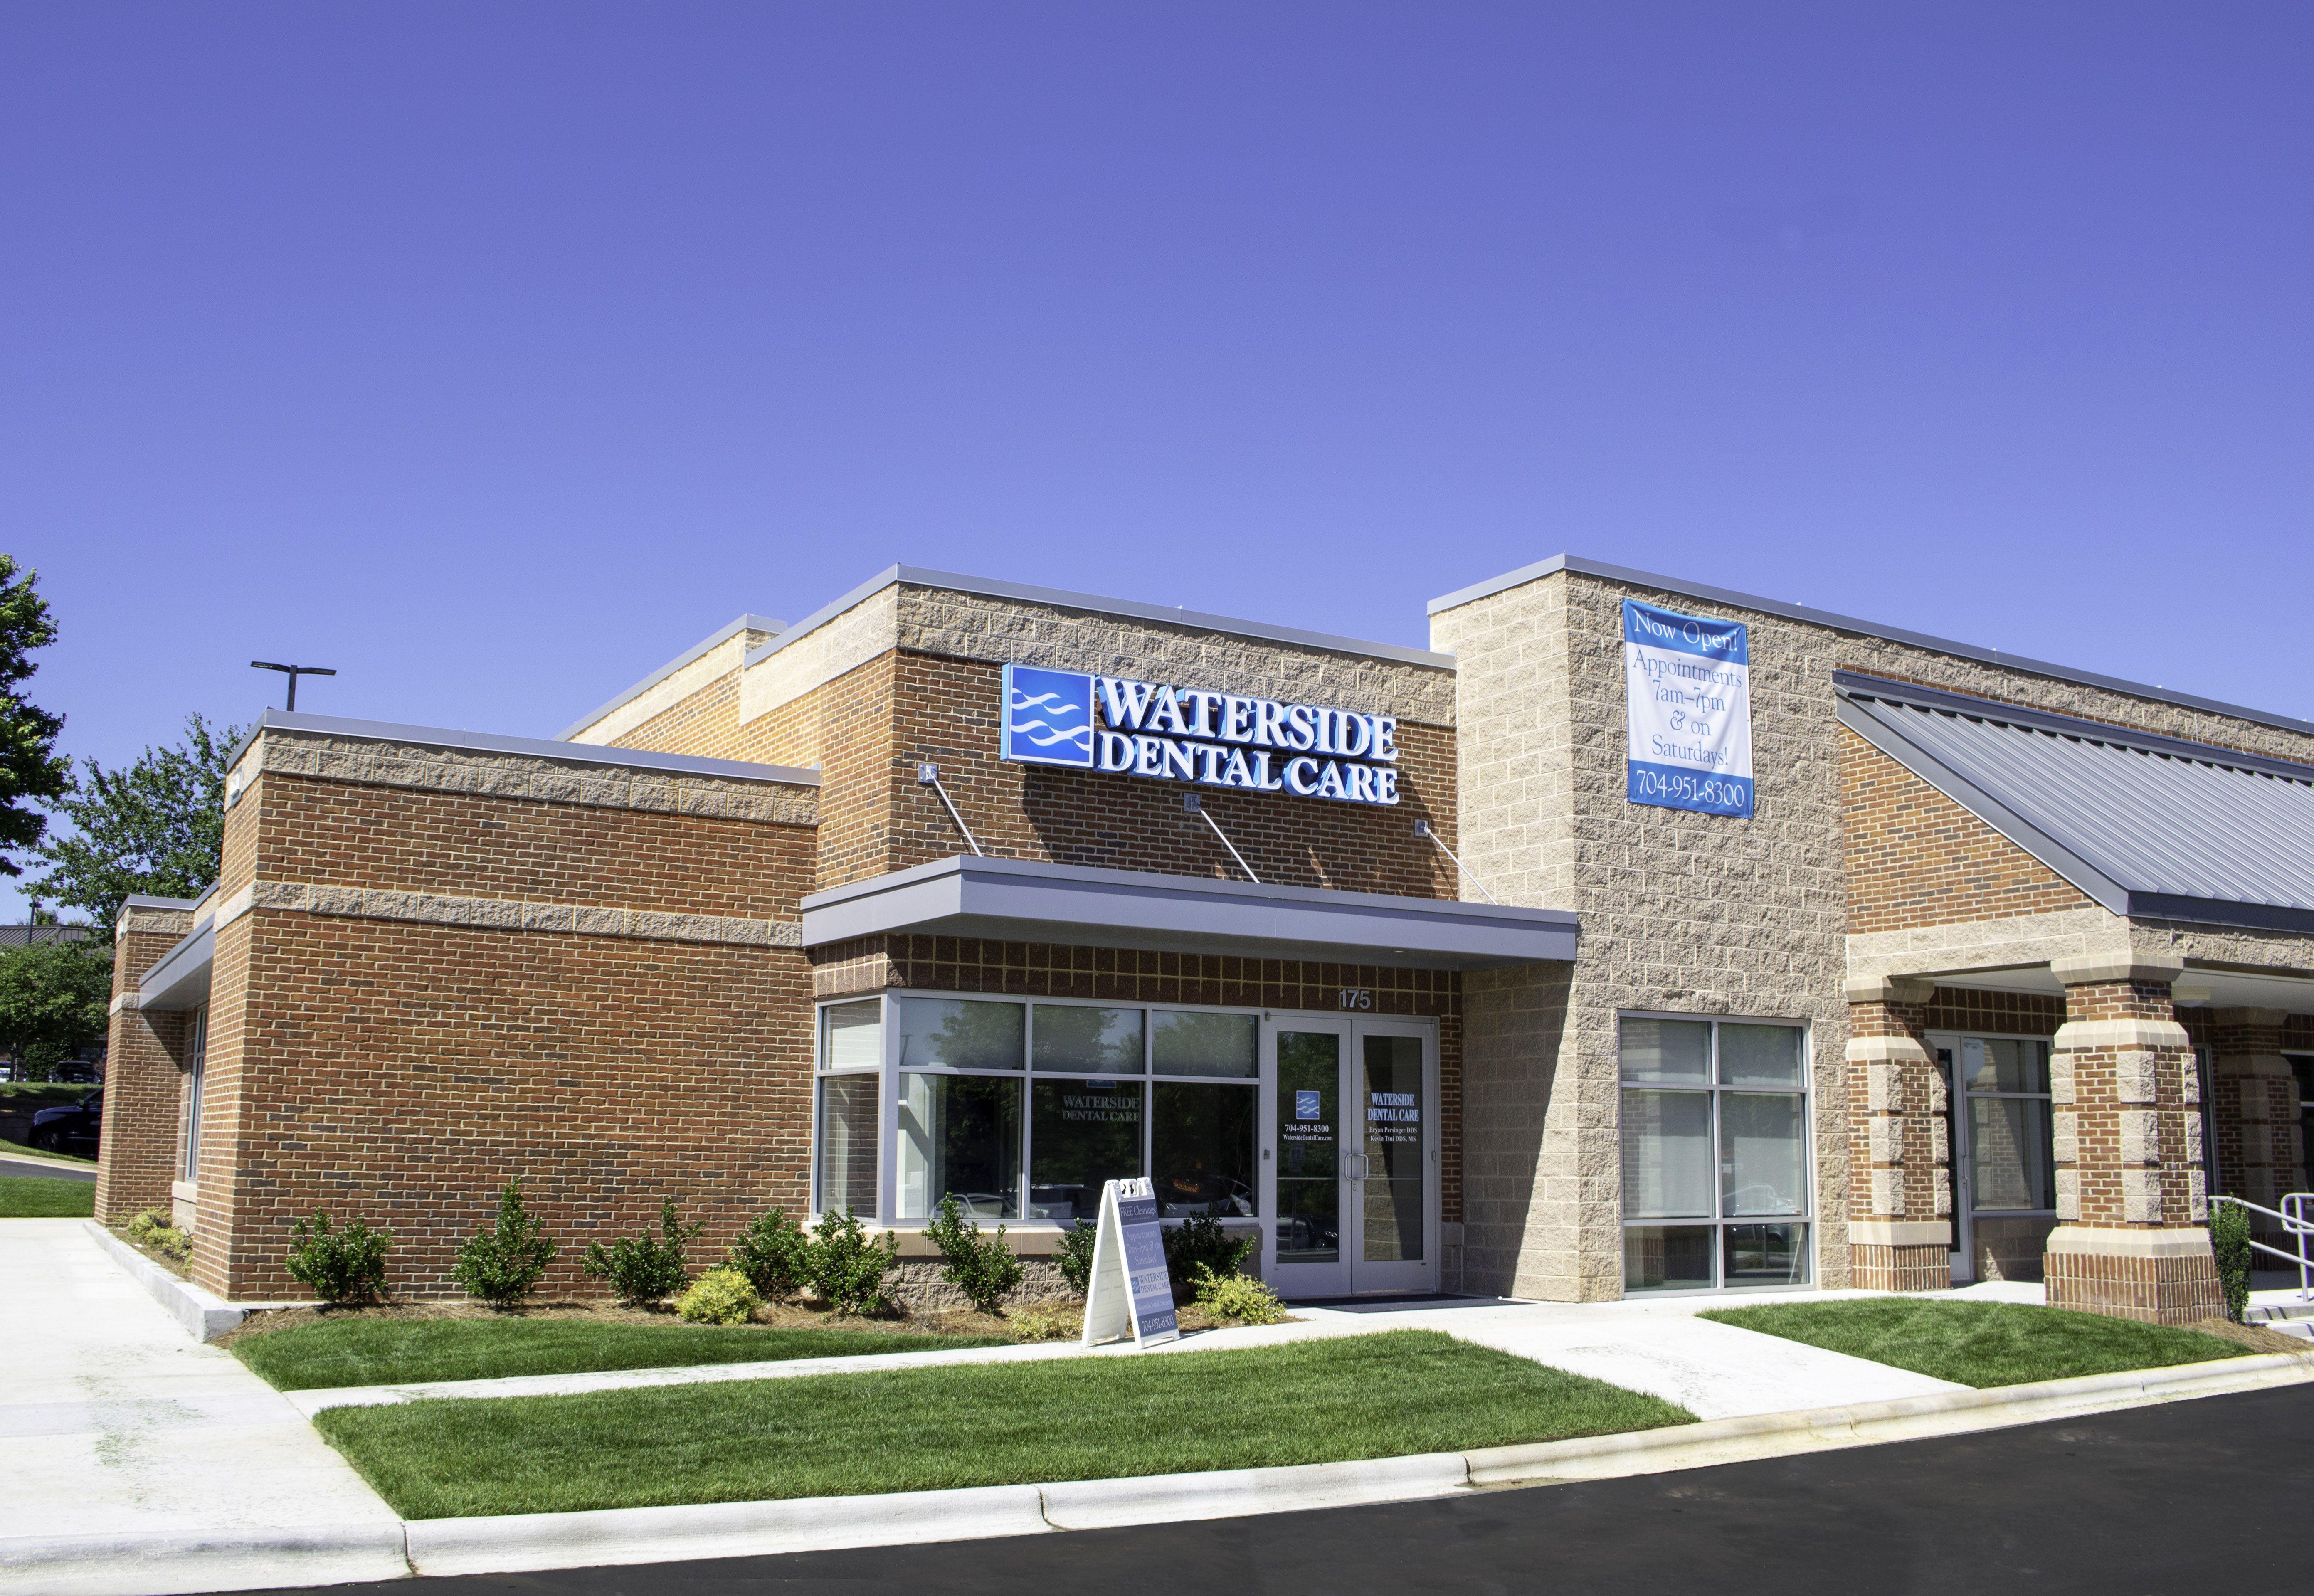 Waterside Dental Care Exteriors Design Ergonomics Inc